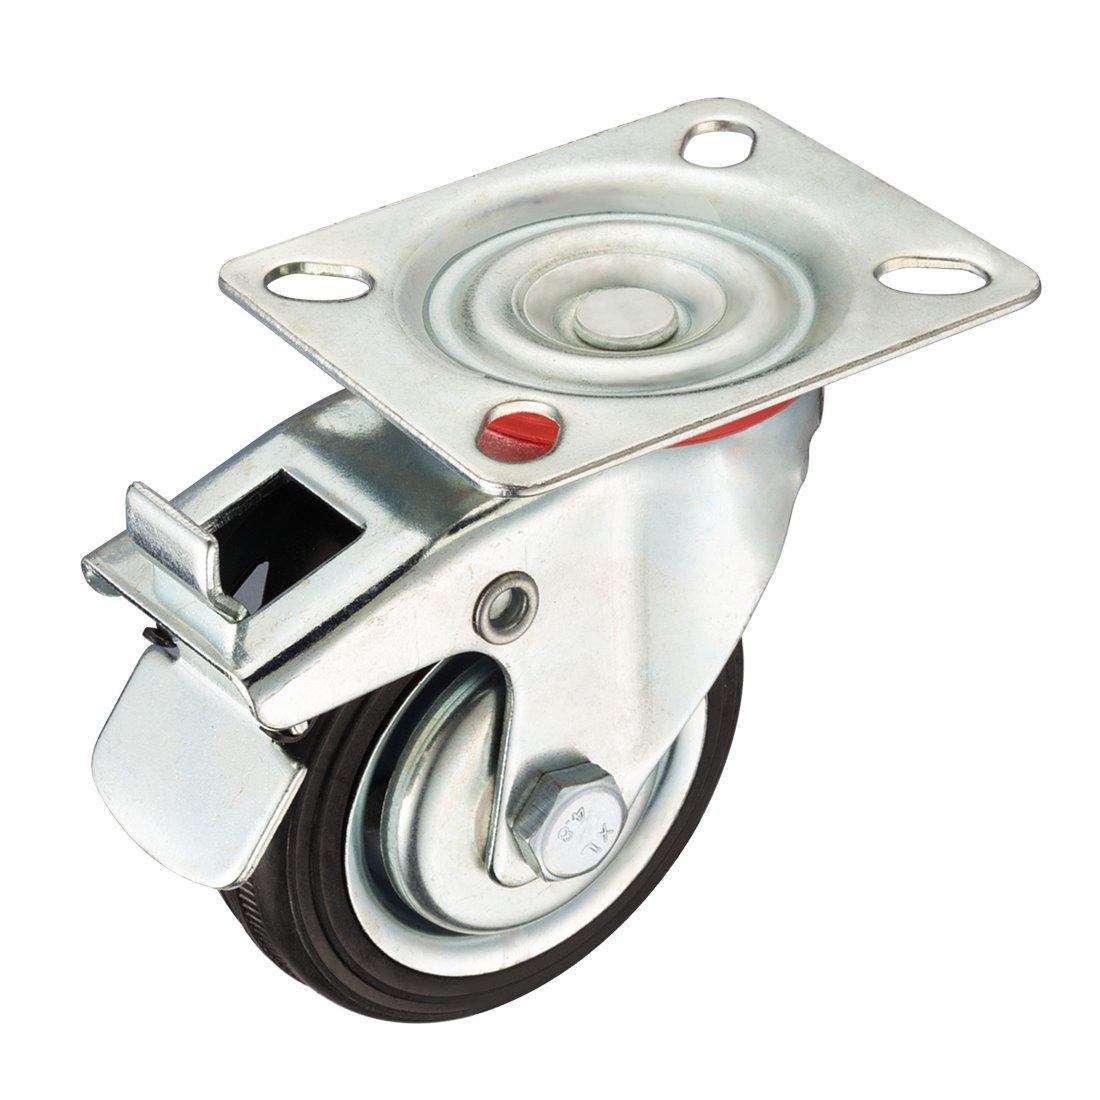 Billiger Preis 3-zoll Gummi Caster Rad Bremse, Swivel Top Platte, 110 £. Last Kapazität Ausgereifte Technologien